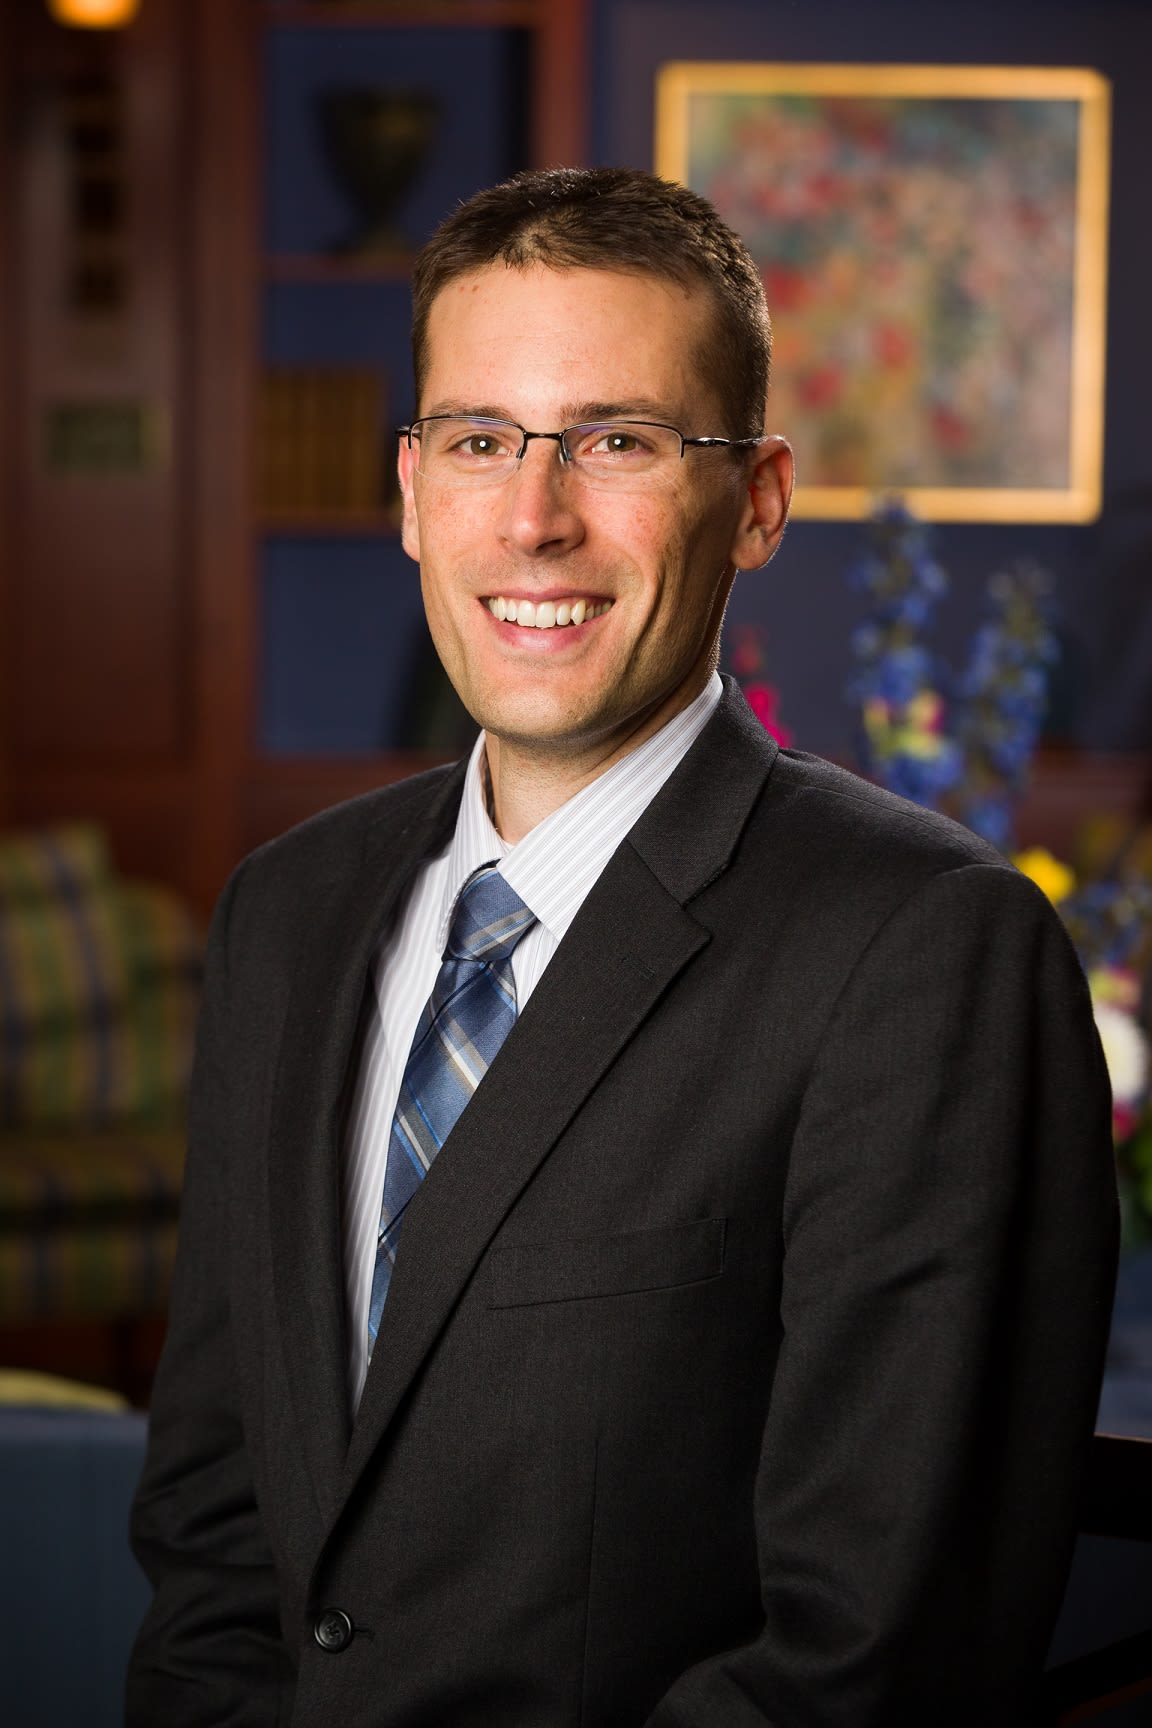 Dr. Jonathon M Spanyer